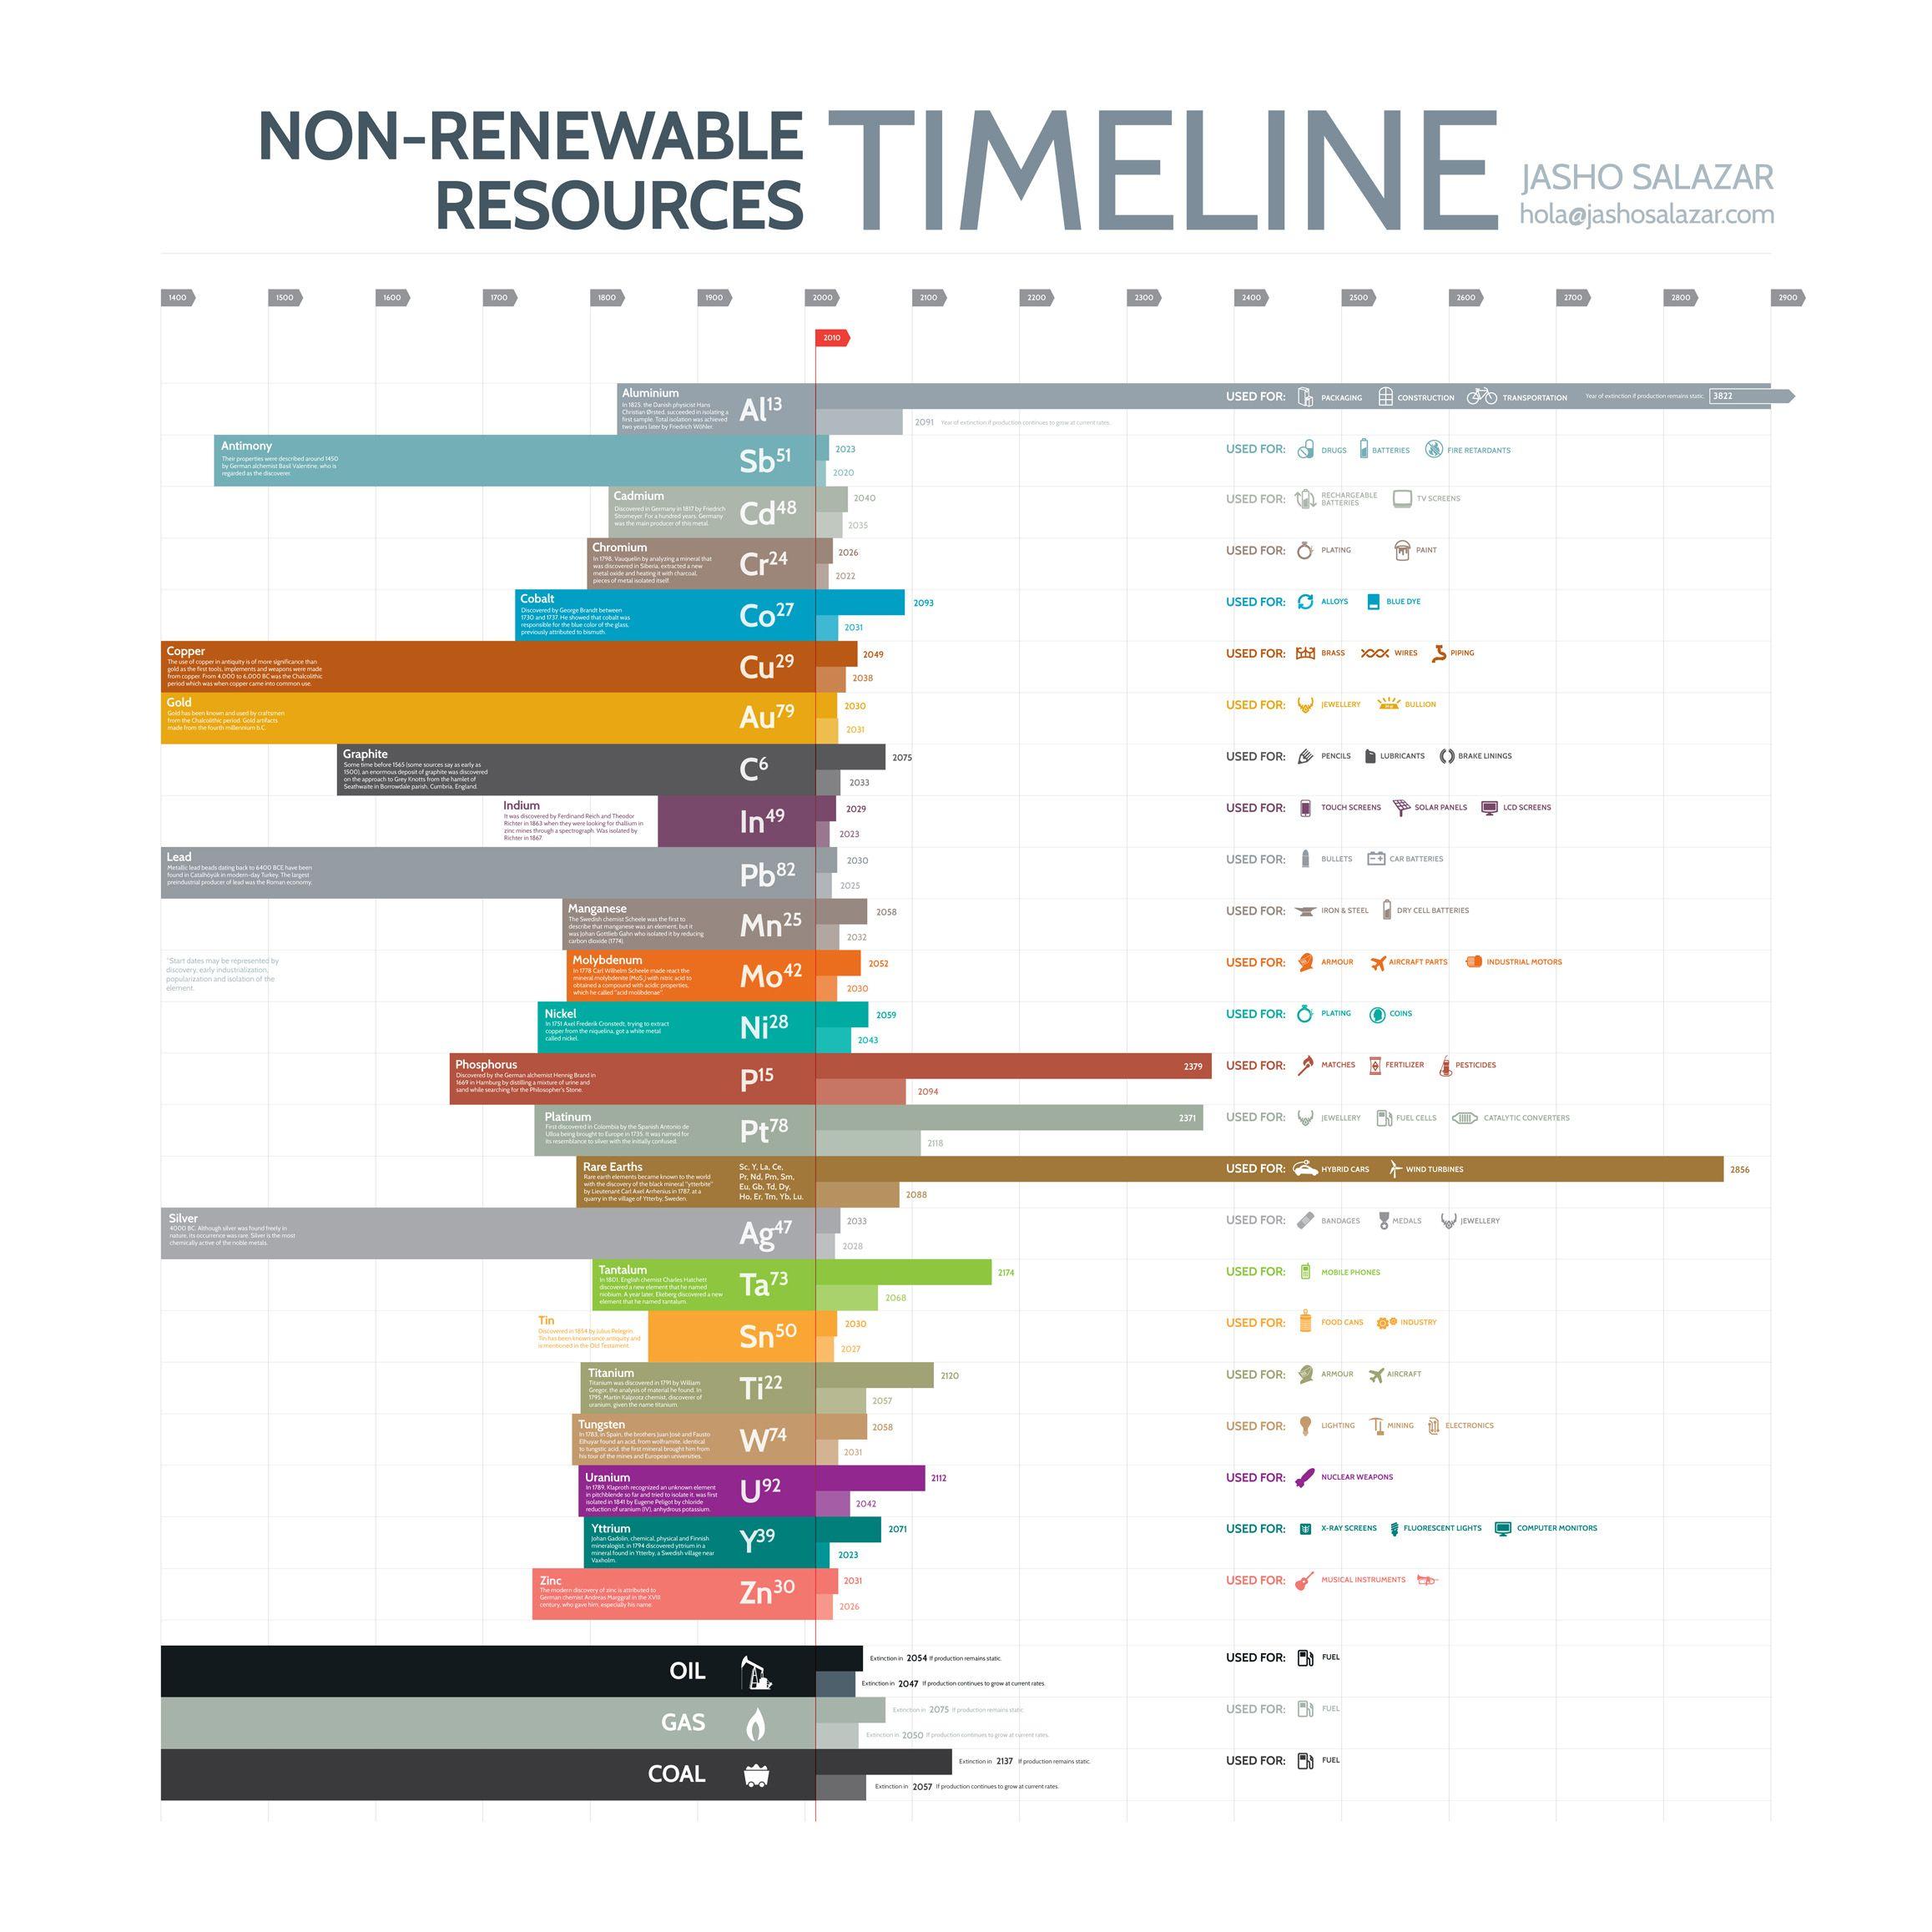 Non Renewable Resources Timeline Examples Of Non Renewable